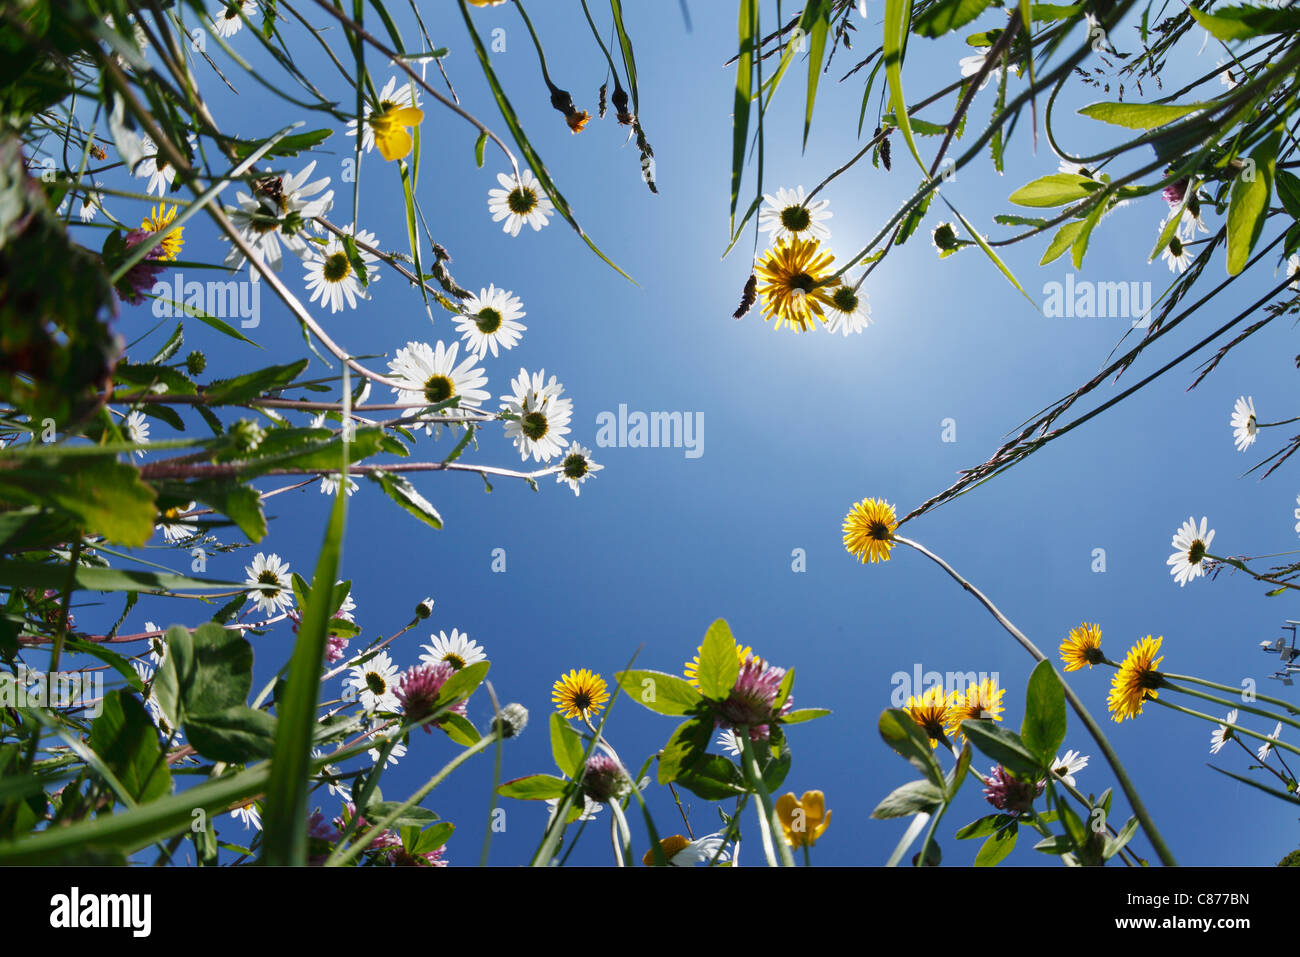 Germany, Bavaria, Upper Bavaria, Irschenberg, Upward view of flower meadow, close up - Stock Image